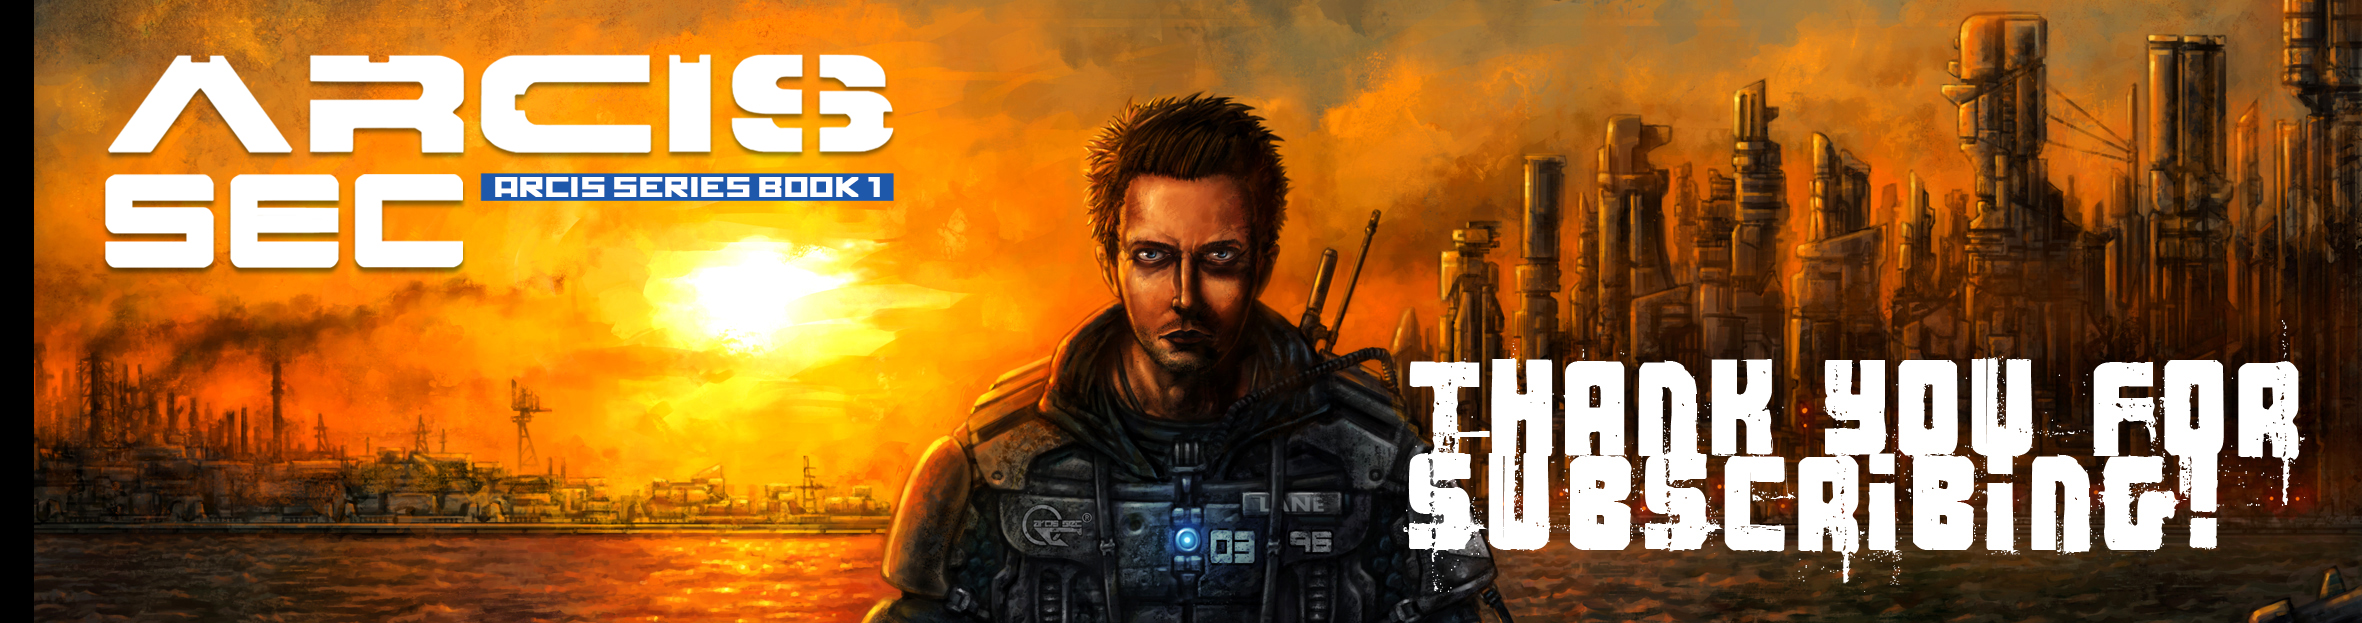 Cyberpunk novel sec banner image thank you.jpg